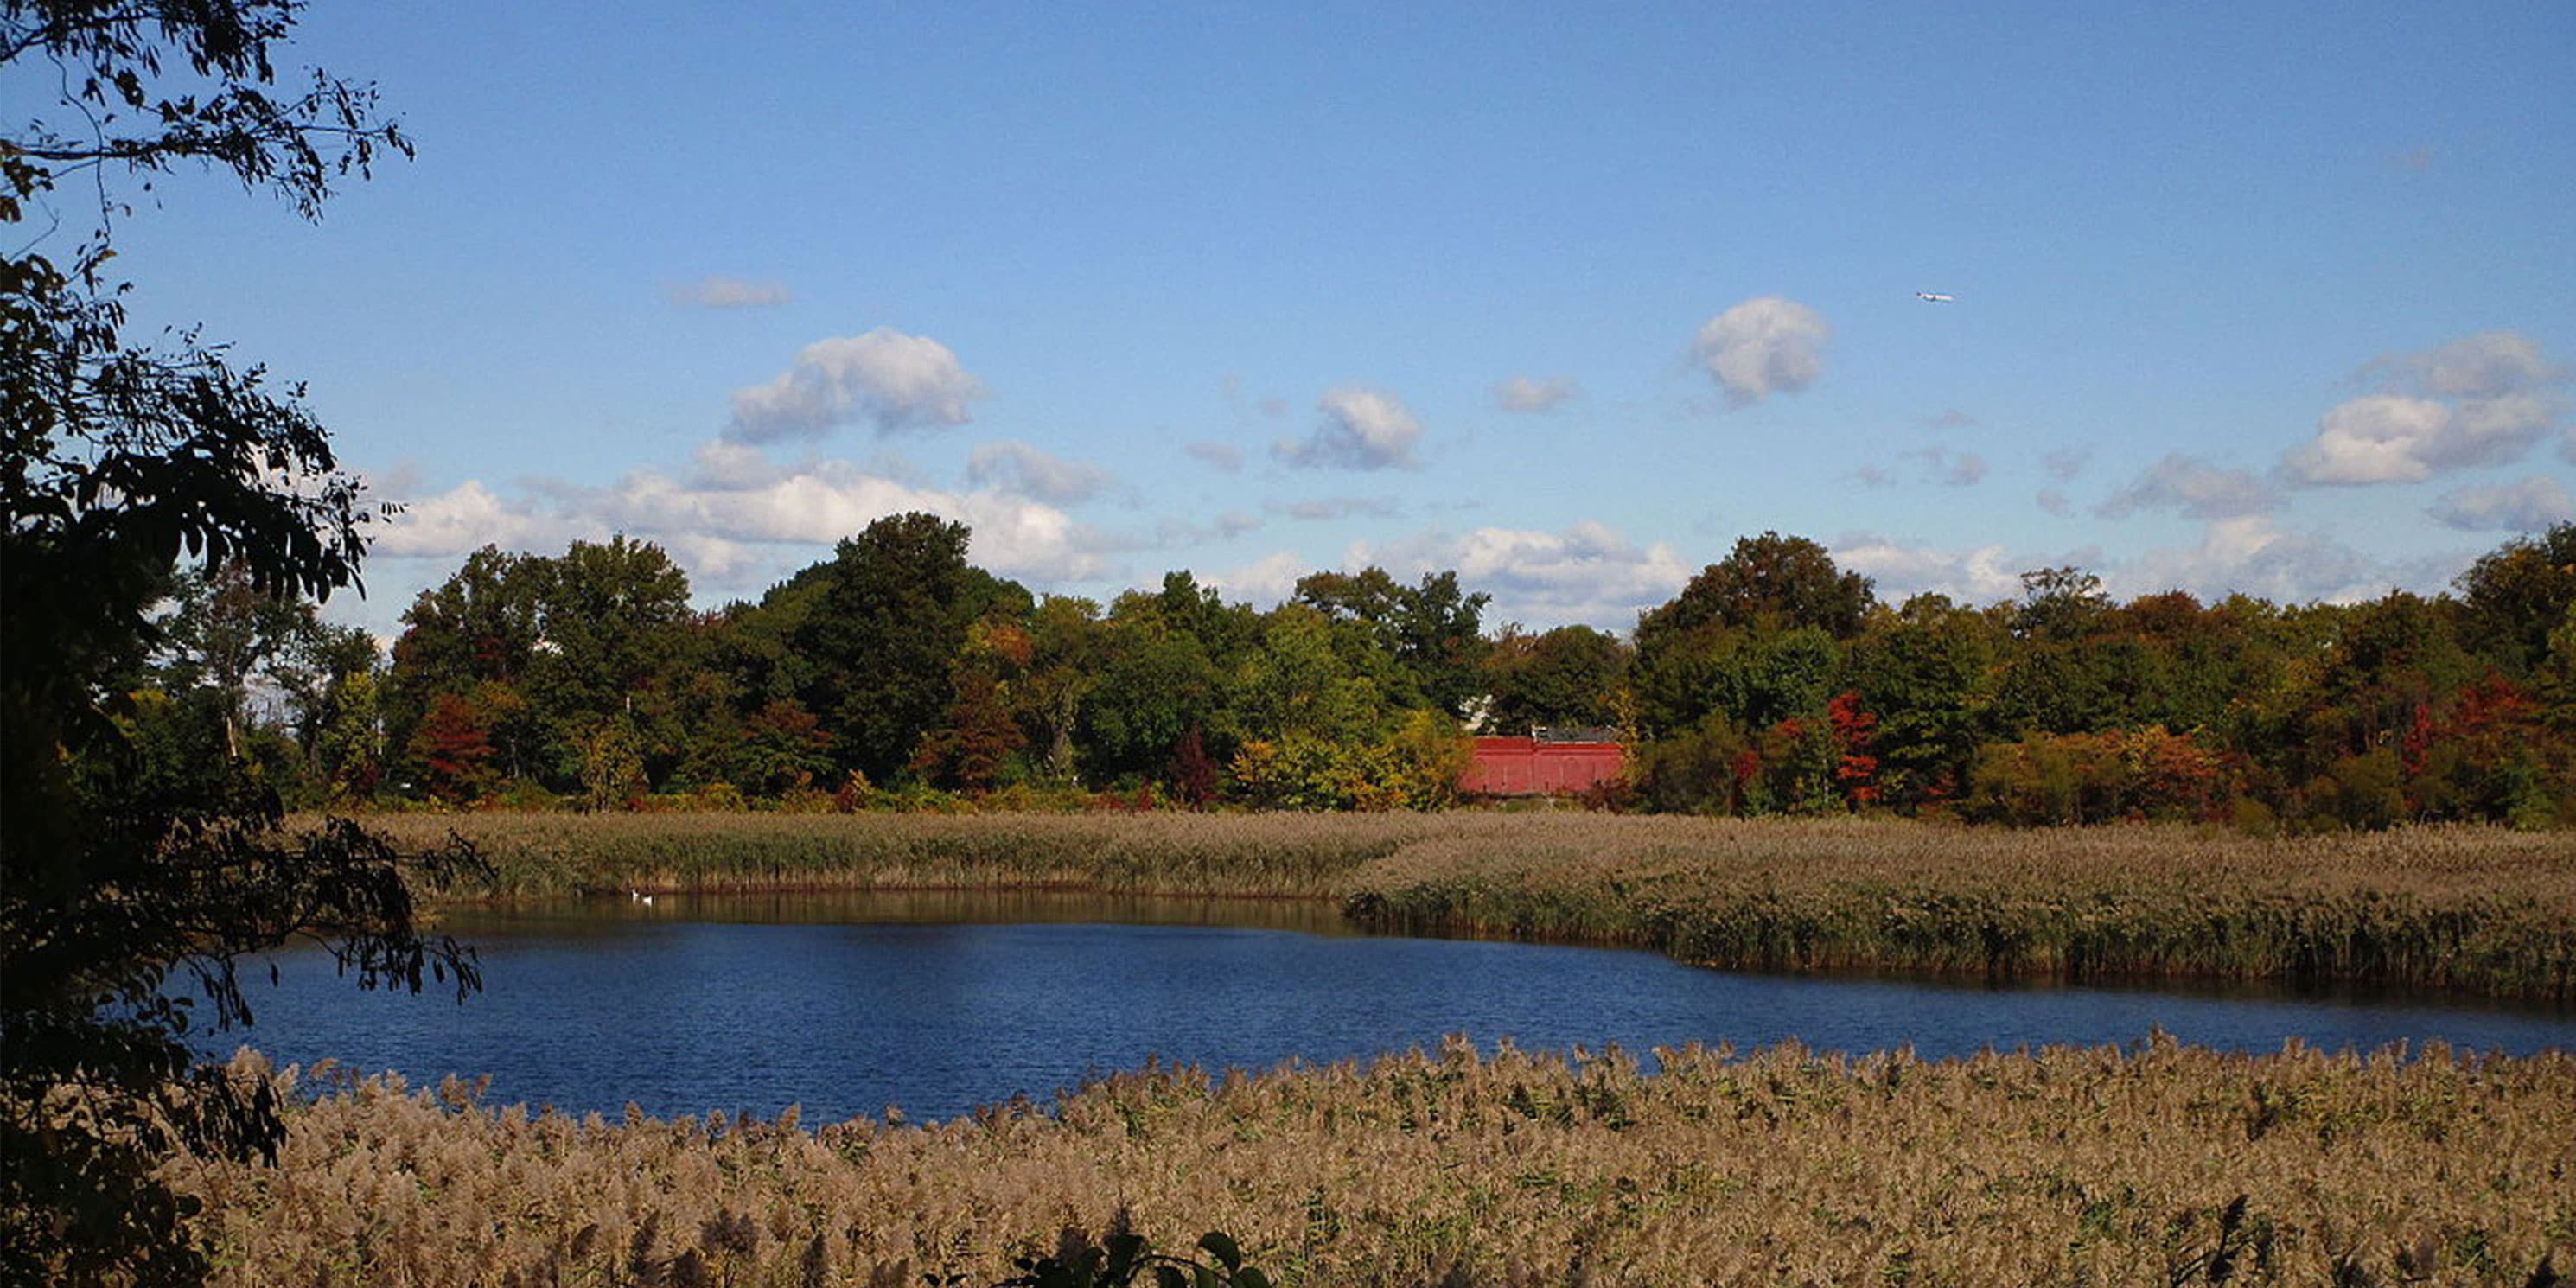 The second basin of the Ridgewood Reservoir